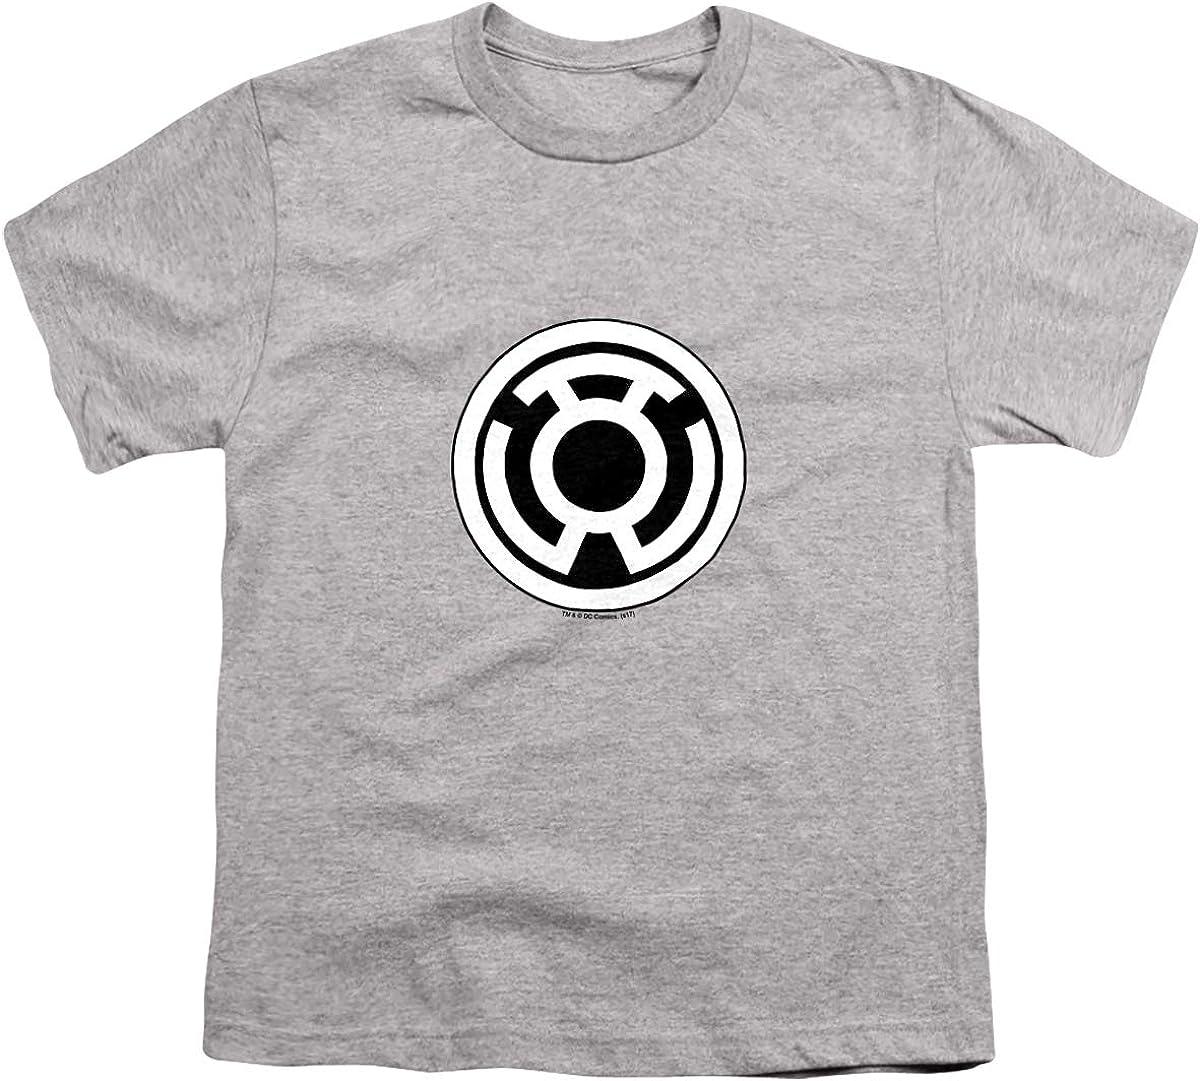 Green Lantern Sinestro Corps Logo Unisex Youth T Shirt, Athletic Heather, Small